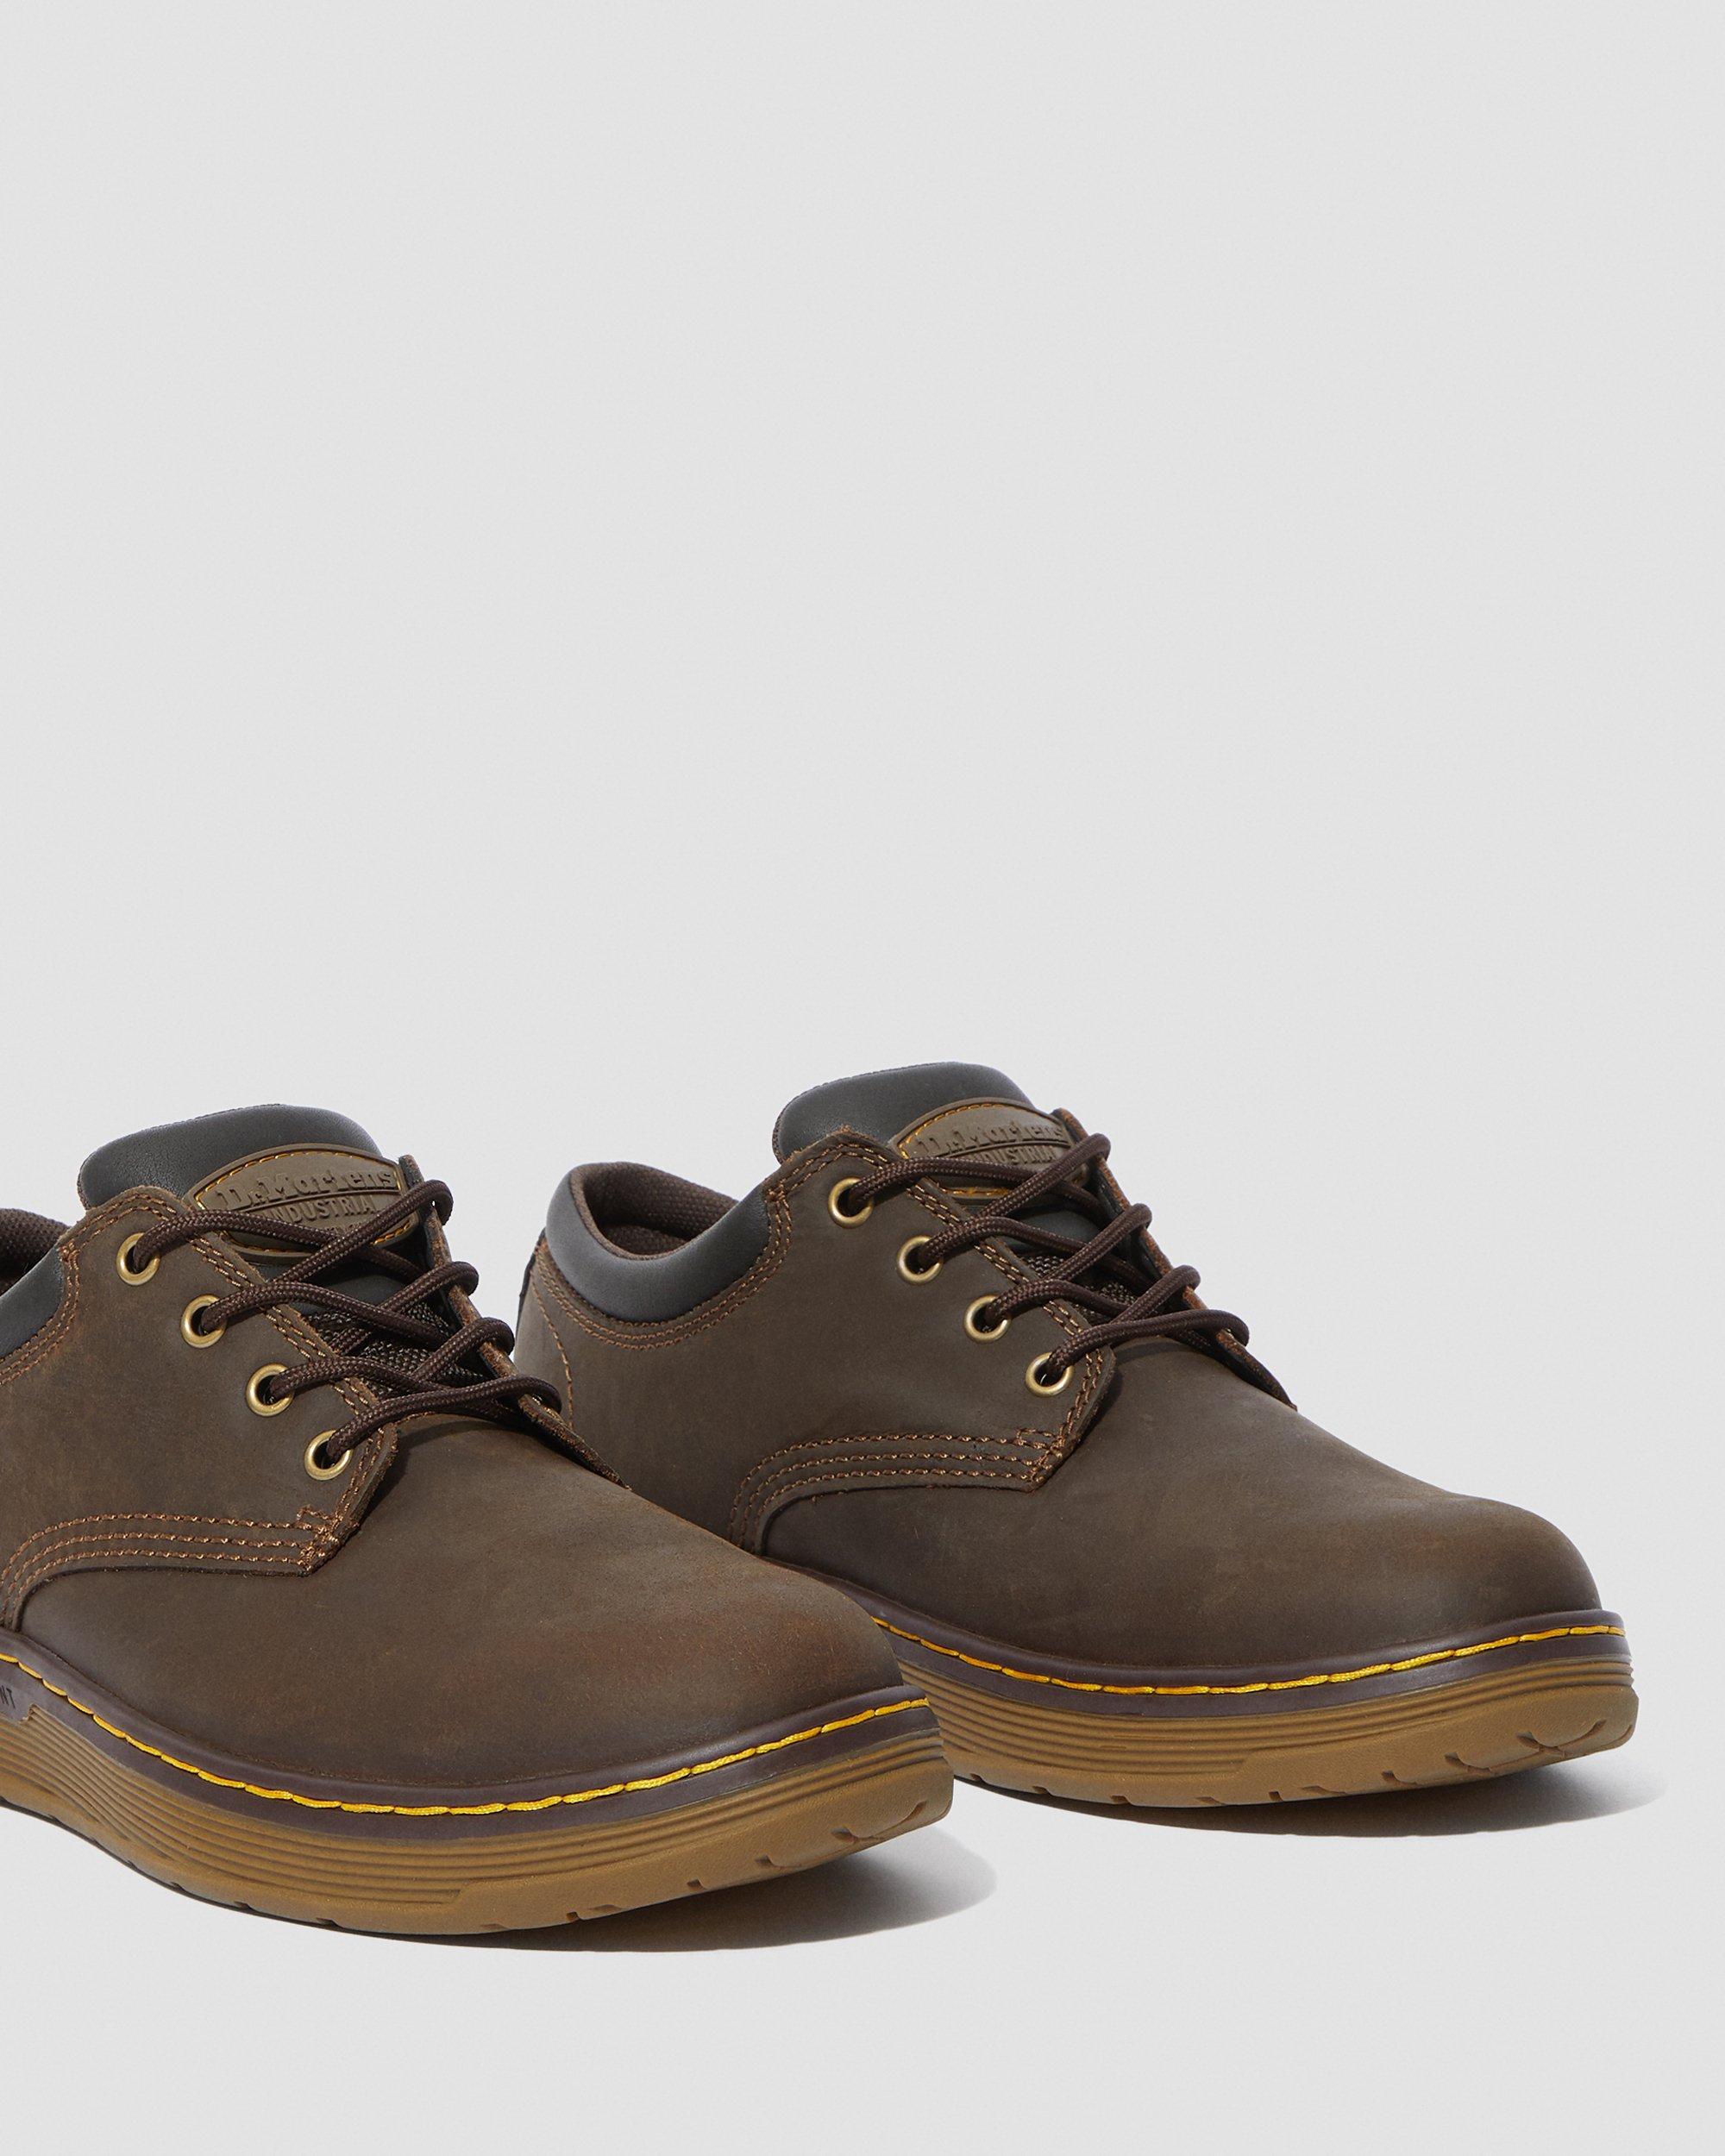 dr martins safety shoes